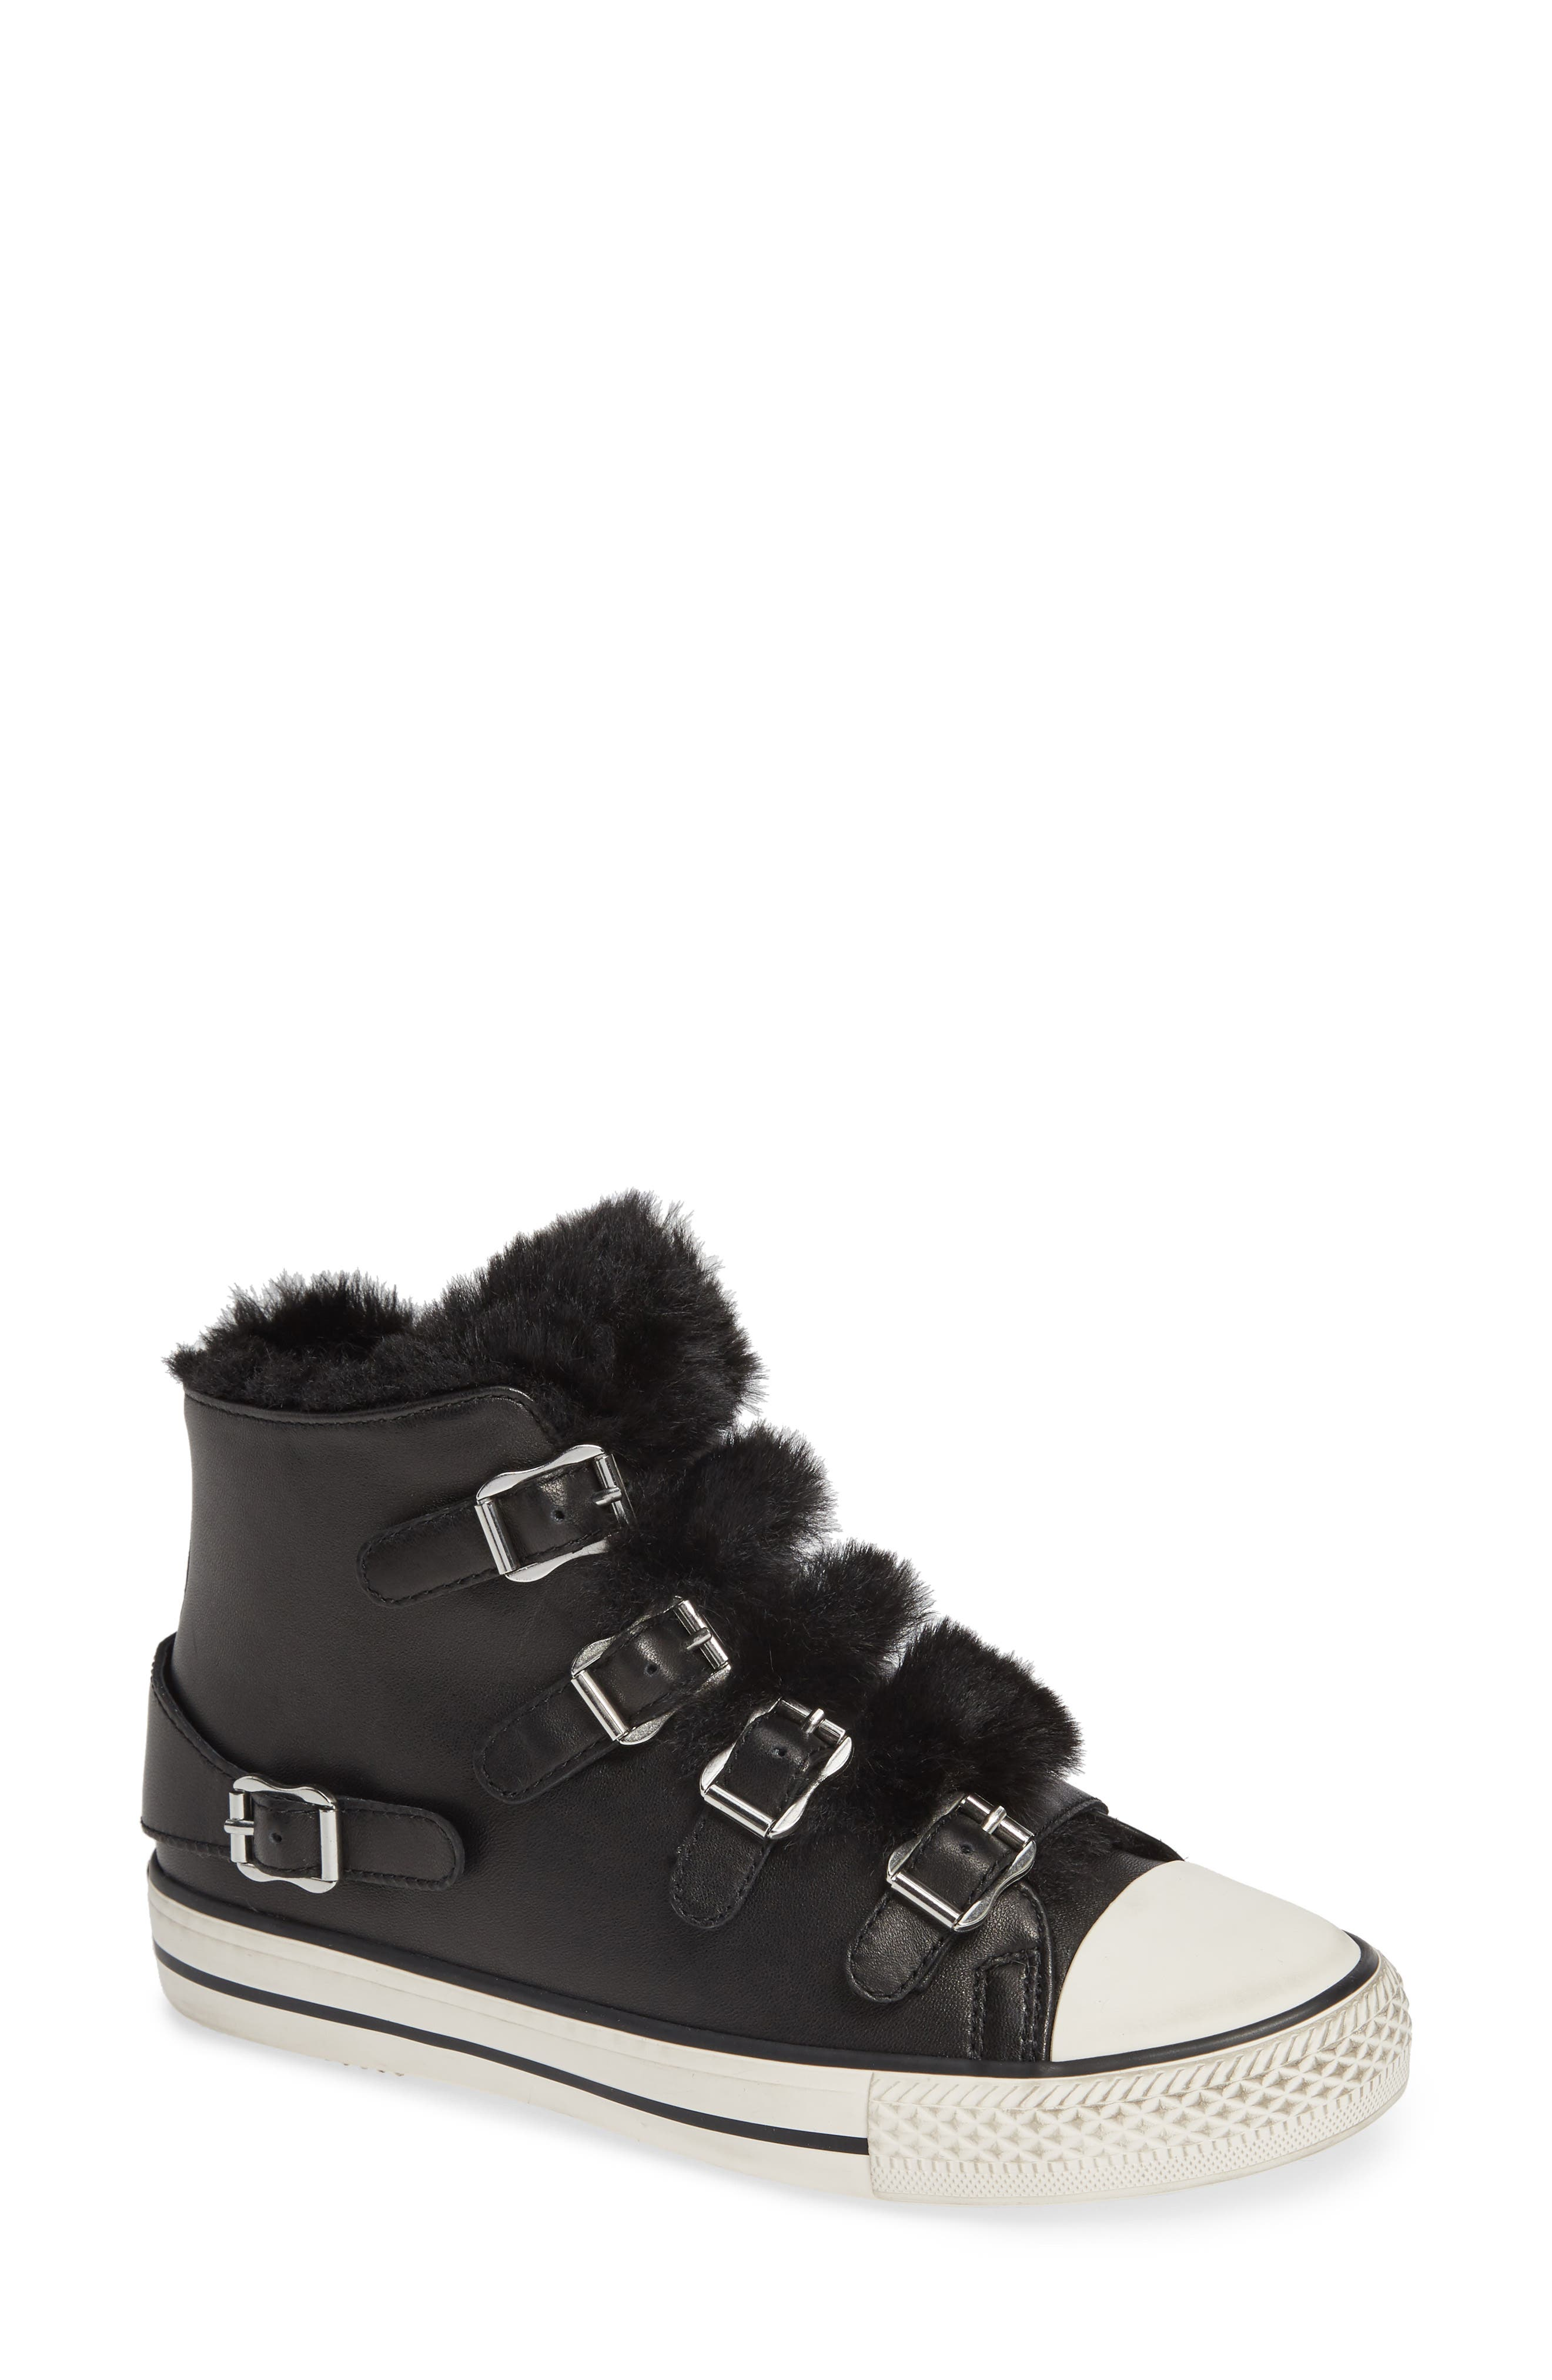 ASH Valko High Top Sneaker, Main, color, BLACK/ BLACK FAUX FUR